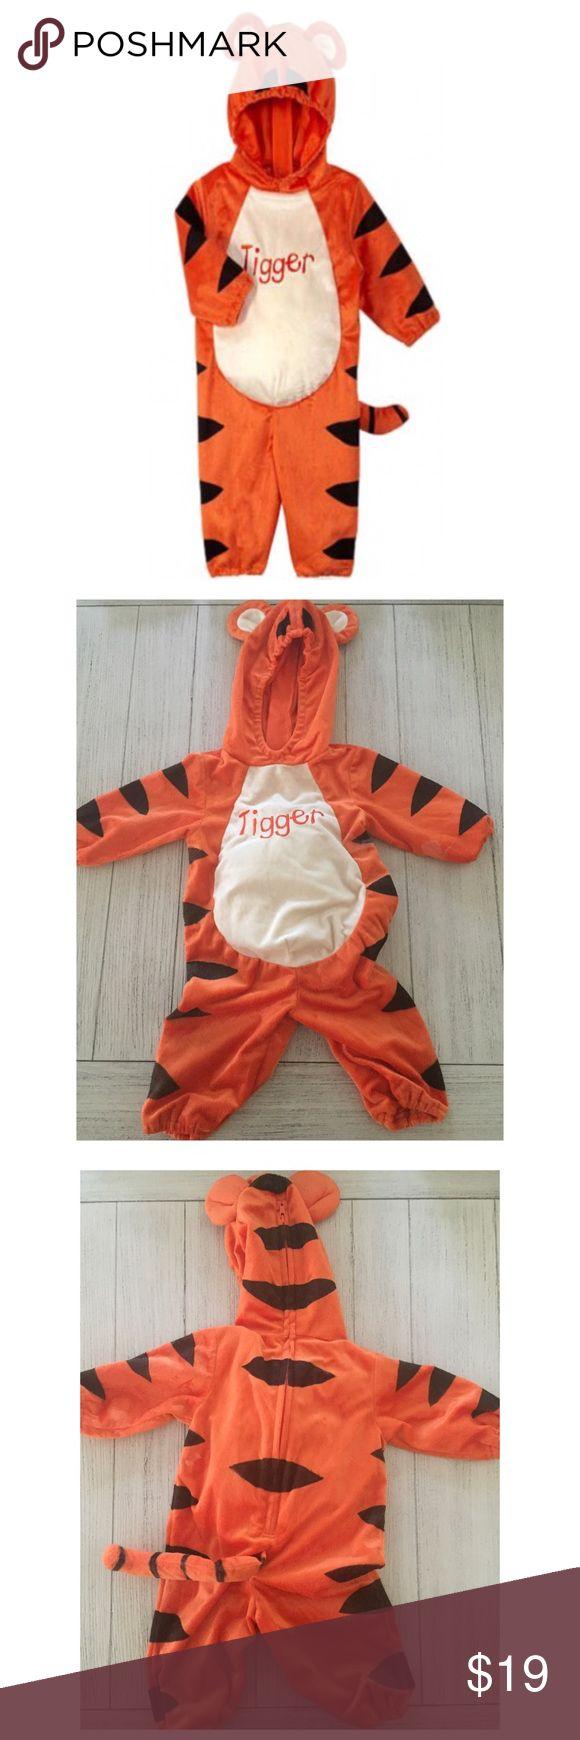 Plush Baby Tigger Costume Disney Baby 9M Plush Tigger Costume Disney Costumes Halloween